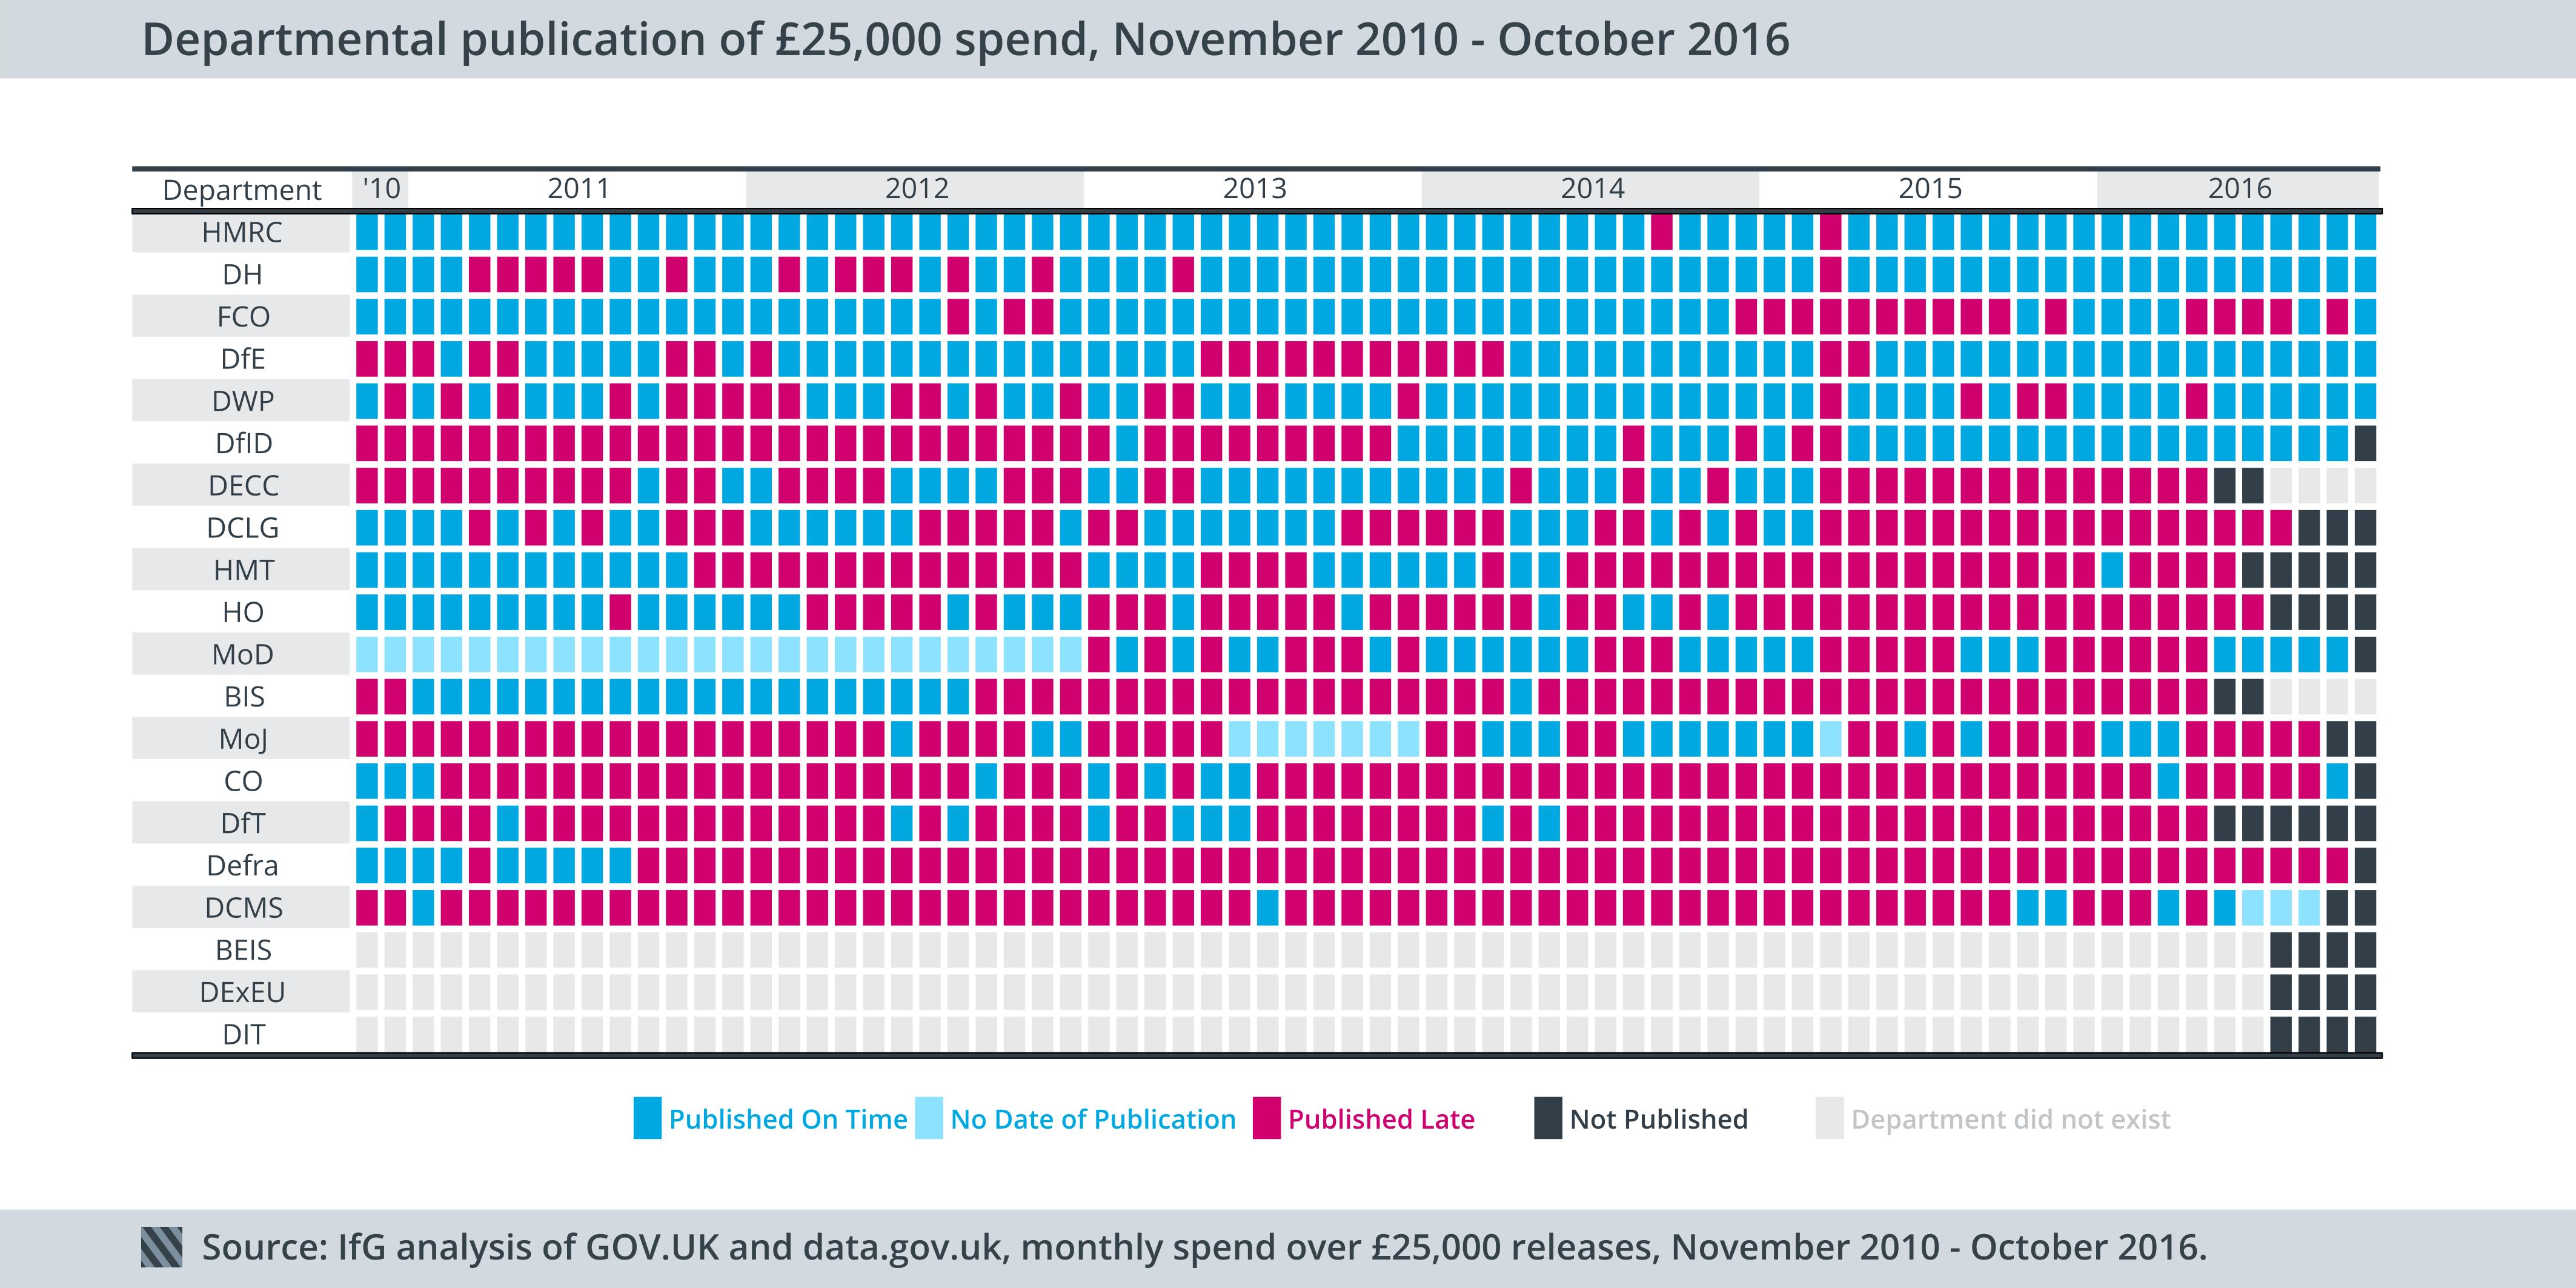 Departmental publication of £25,000 spend